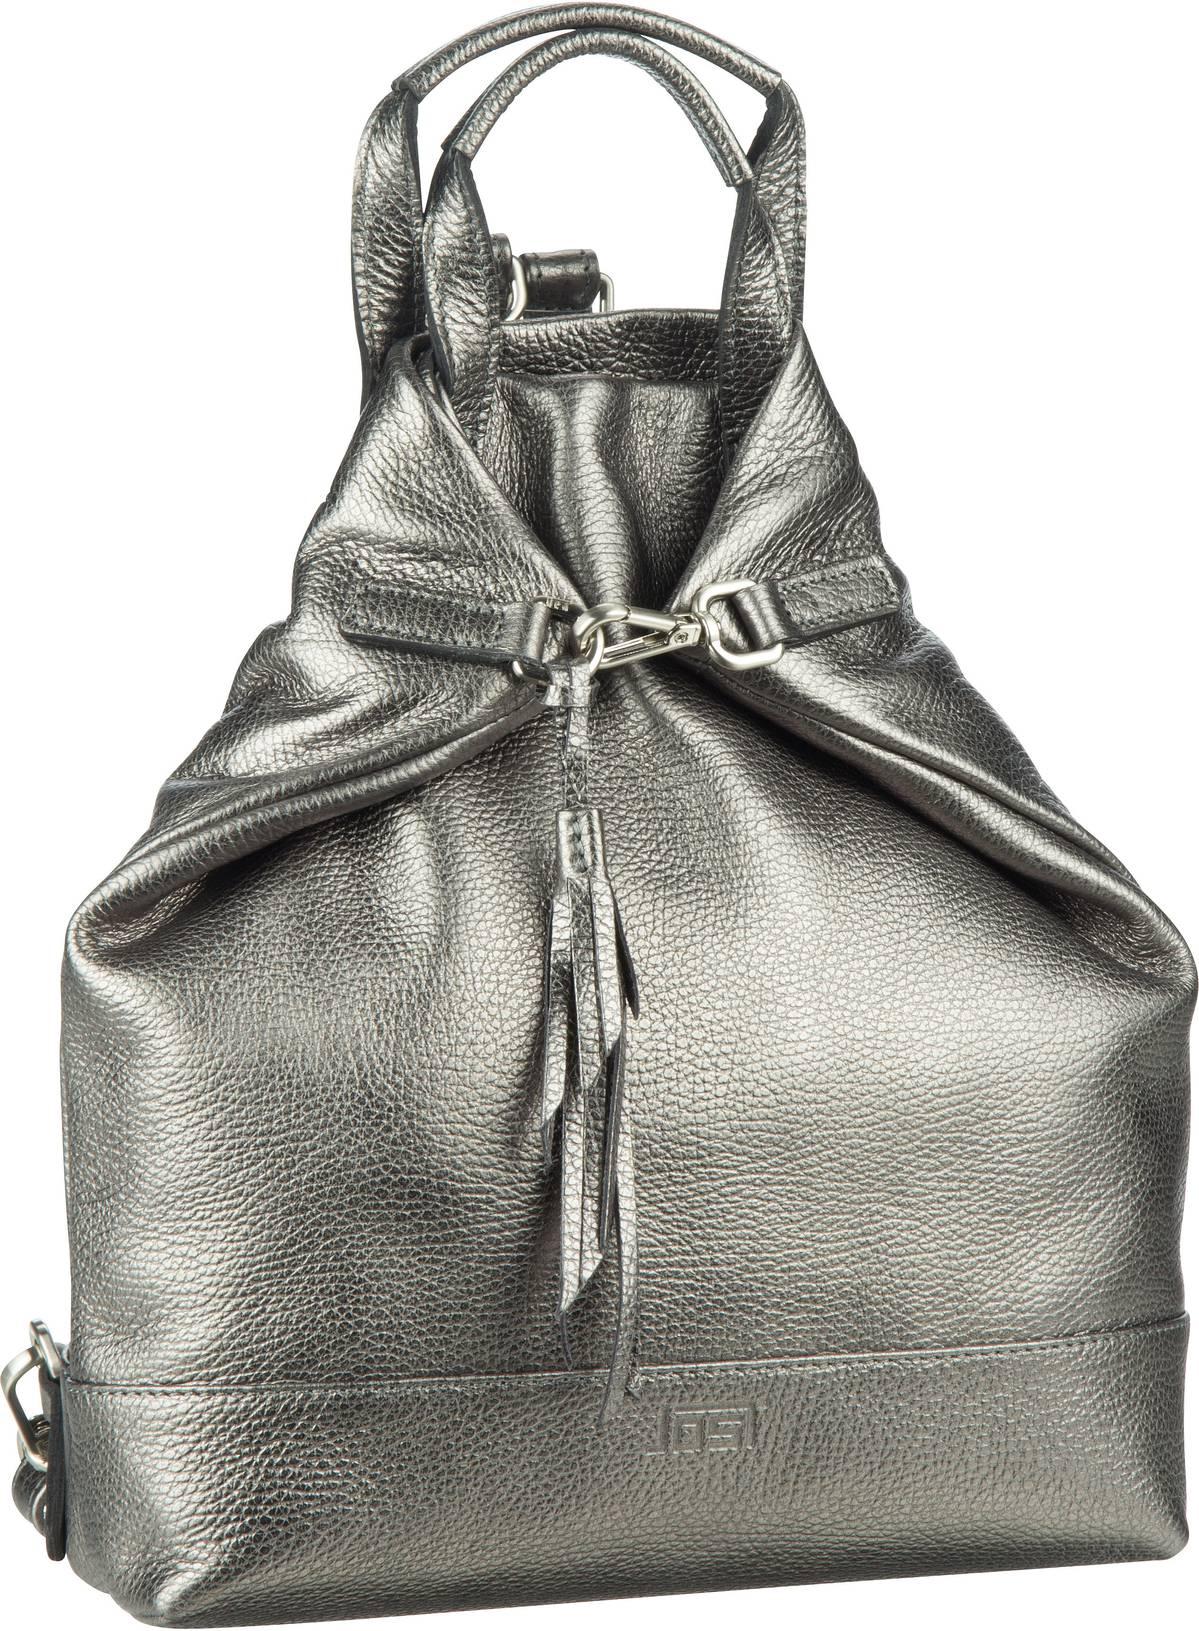 Rucksack / Daypack Vika 1963 X-Change 3in1 Bag XS Silver